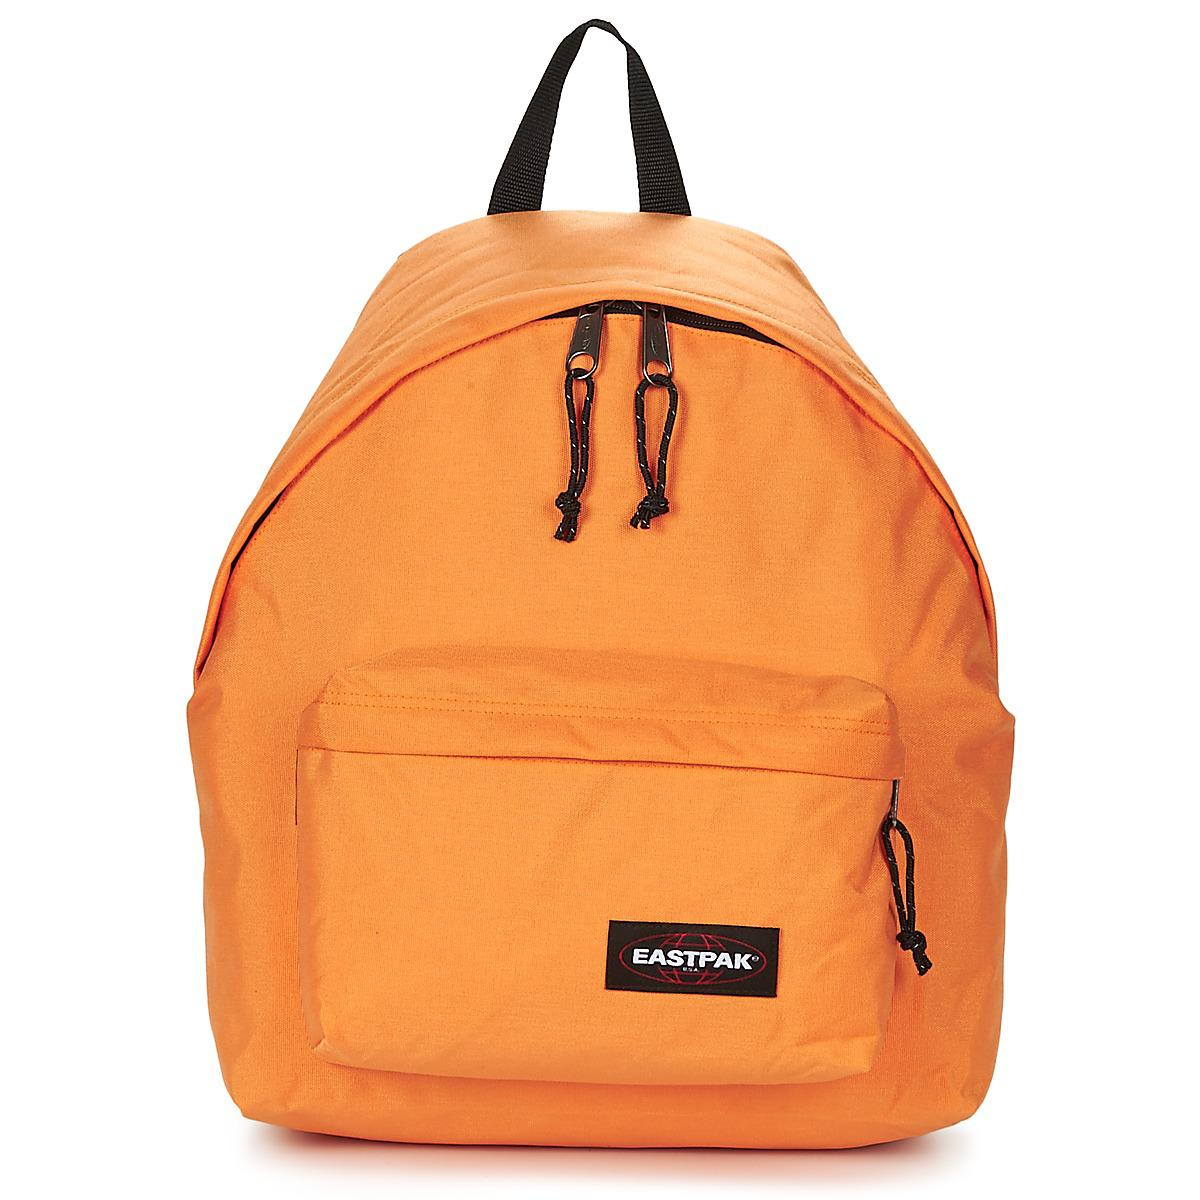 Eastpak A Sac Orange Eastpak Dos Sac Eastpak Orange Dos Sac A rp6Sqr8